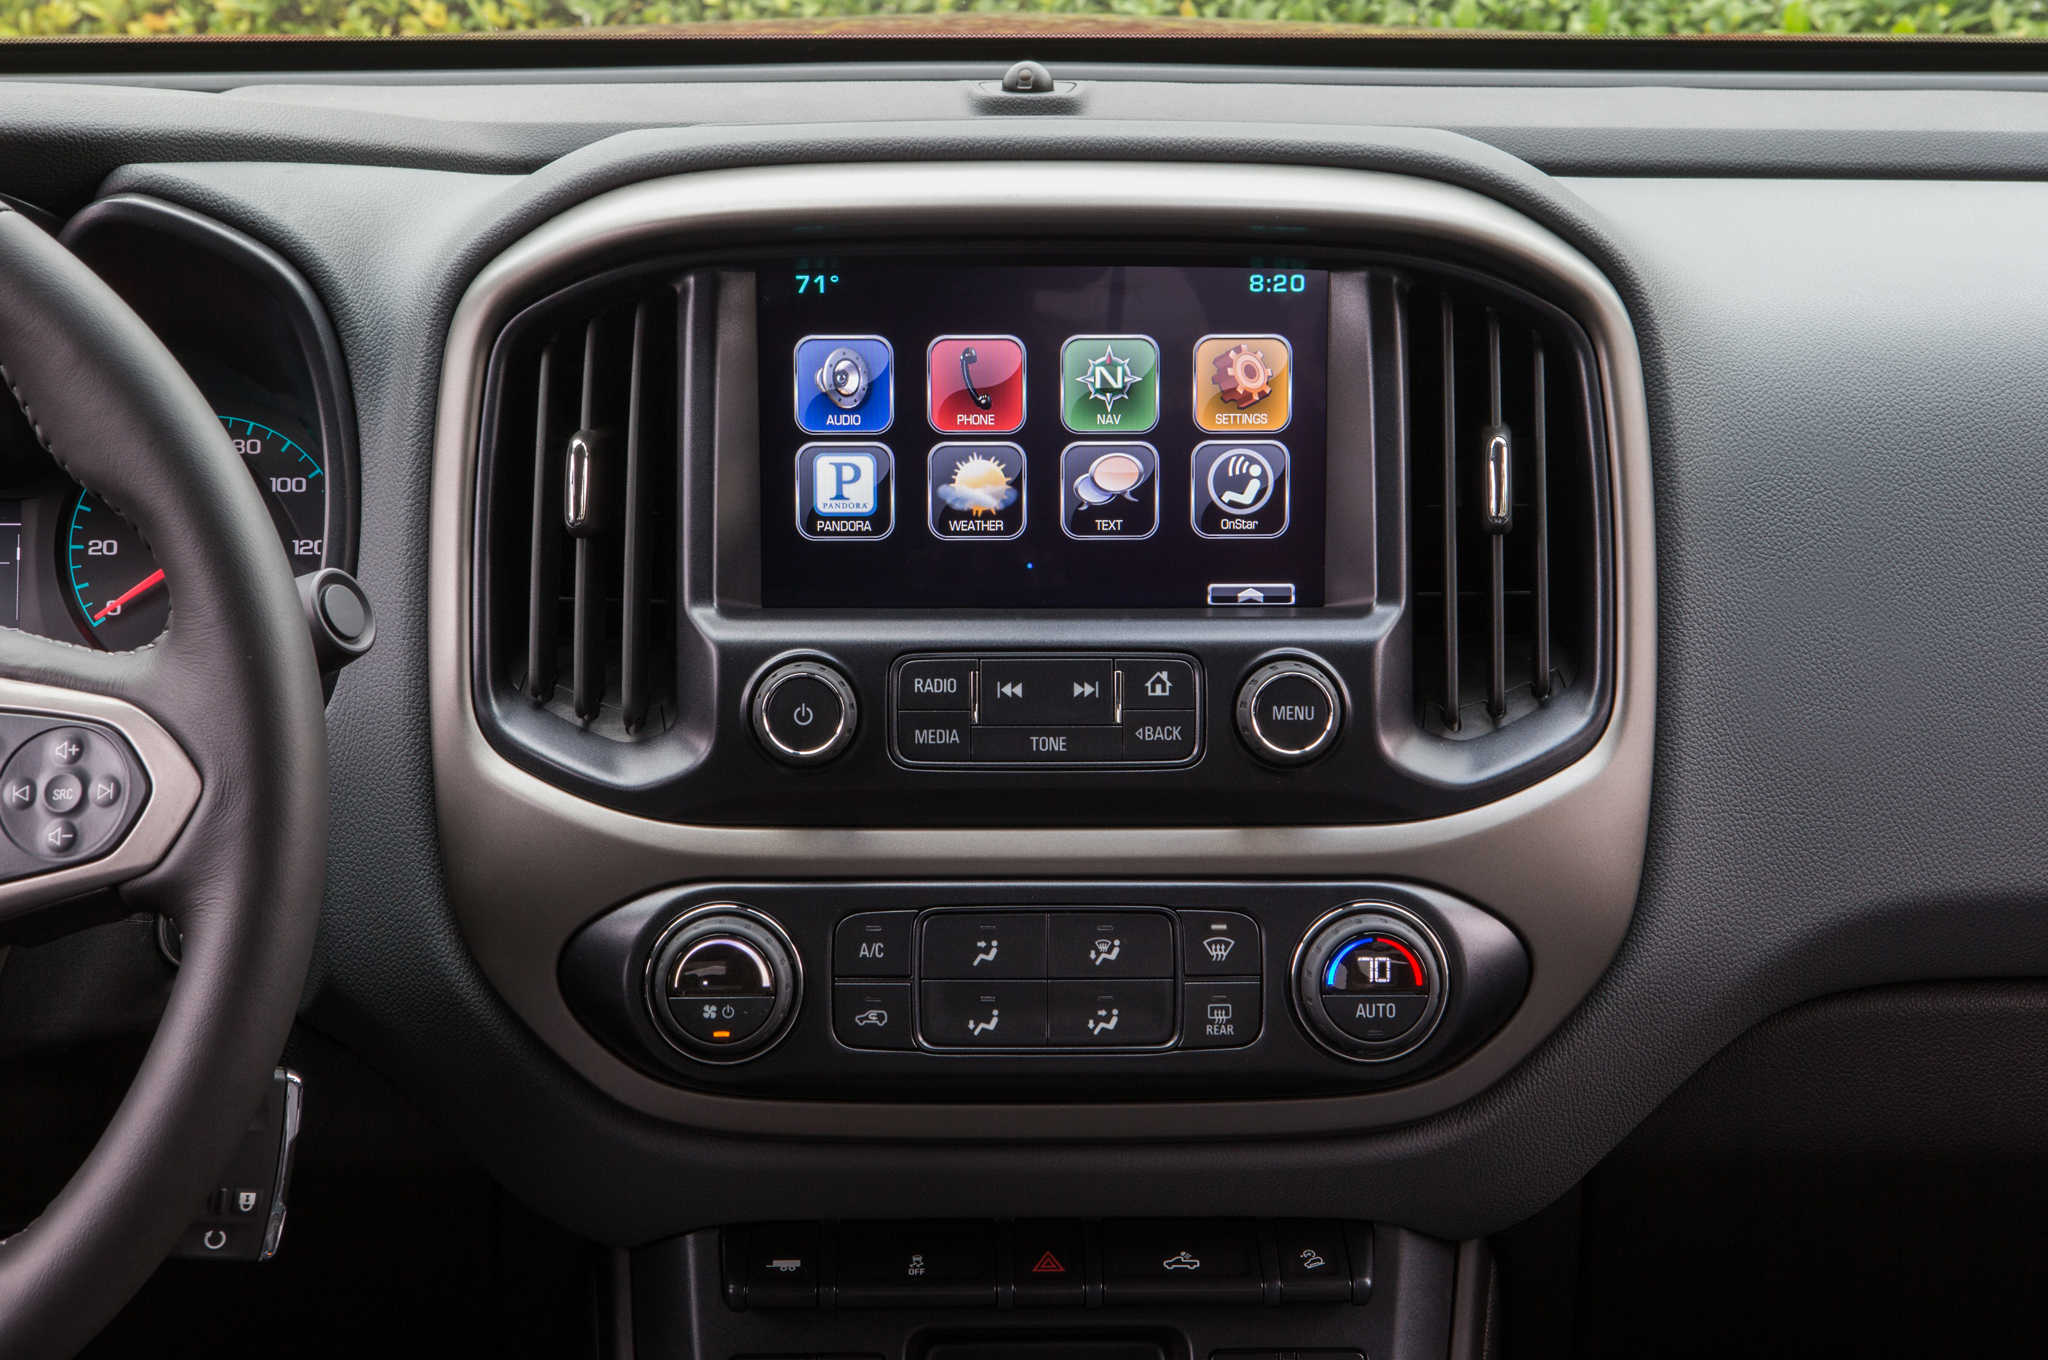 Sg 6559 Chevrolet Colorado Truck Stereo Wiring Download Diagram